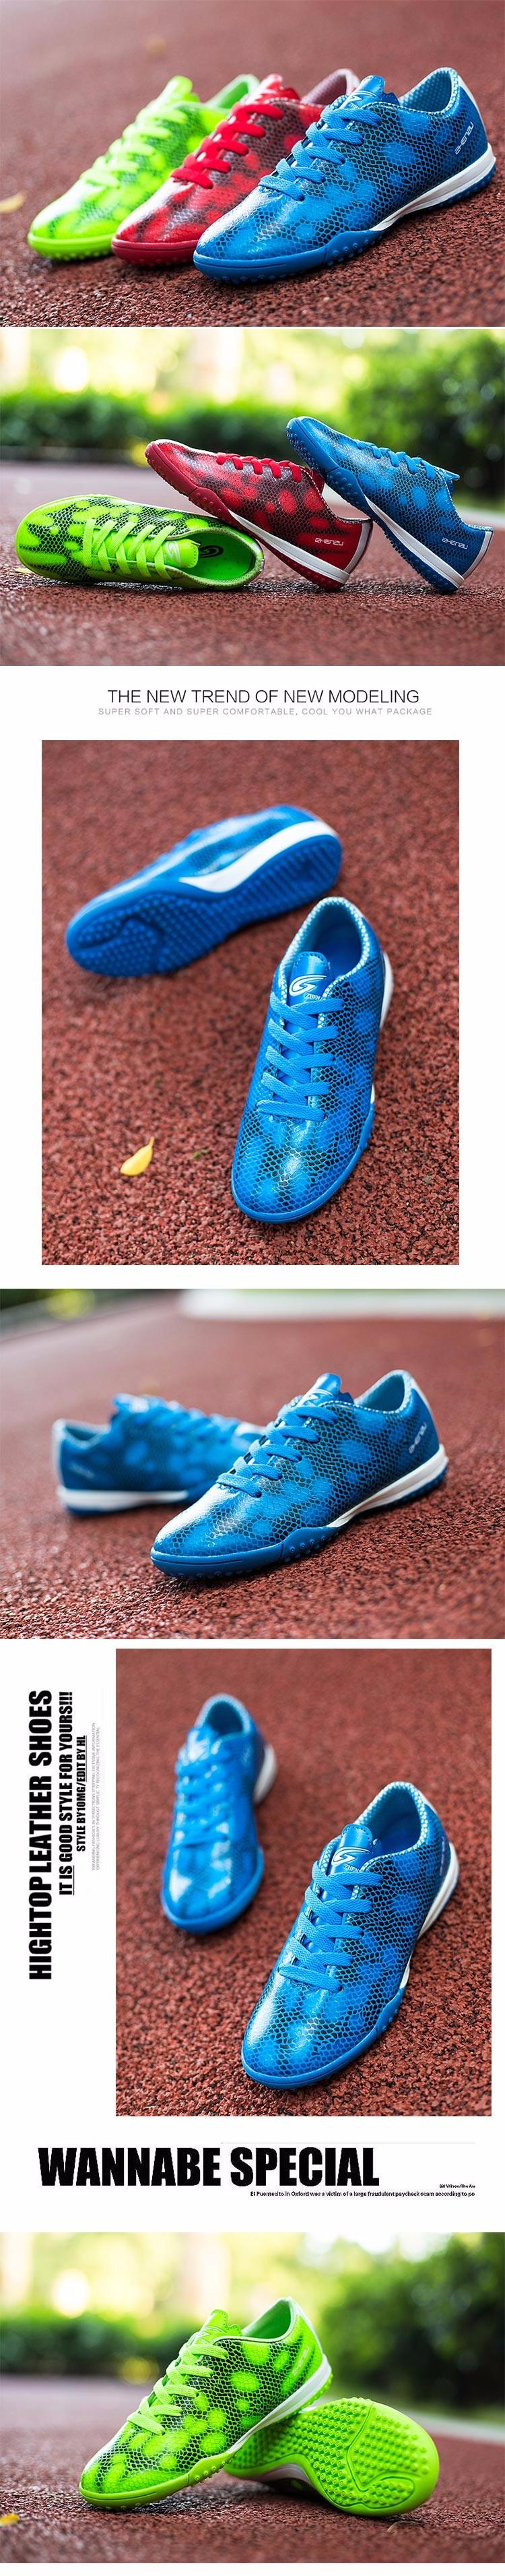 ZHENZU Football Boots Superfly Original Soccer Shoes Cleats Kids Teenagers Training AG HG TF voetbalschoenen chuteira futebol